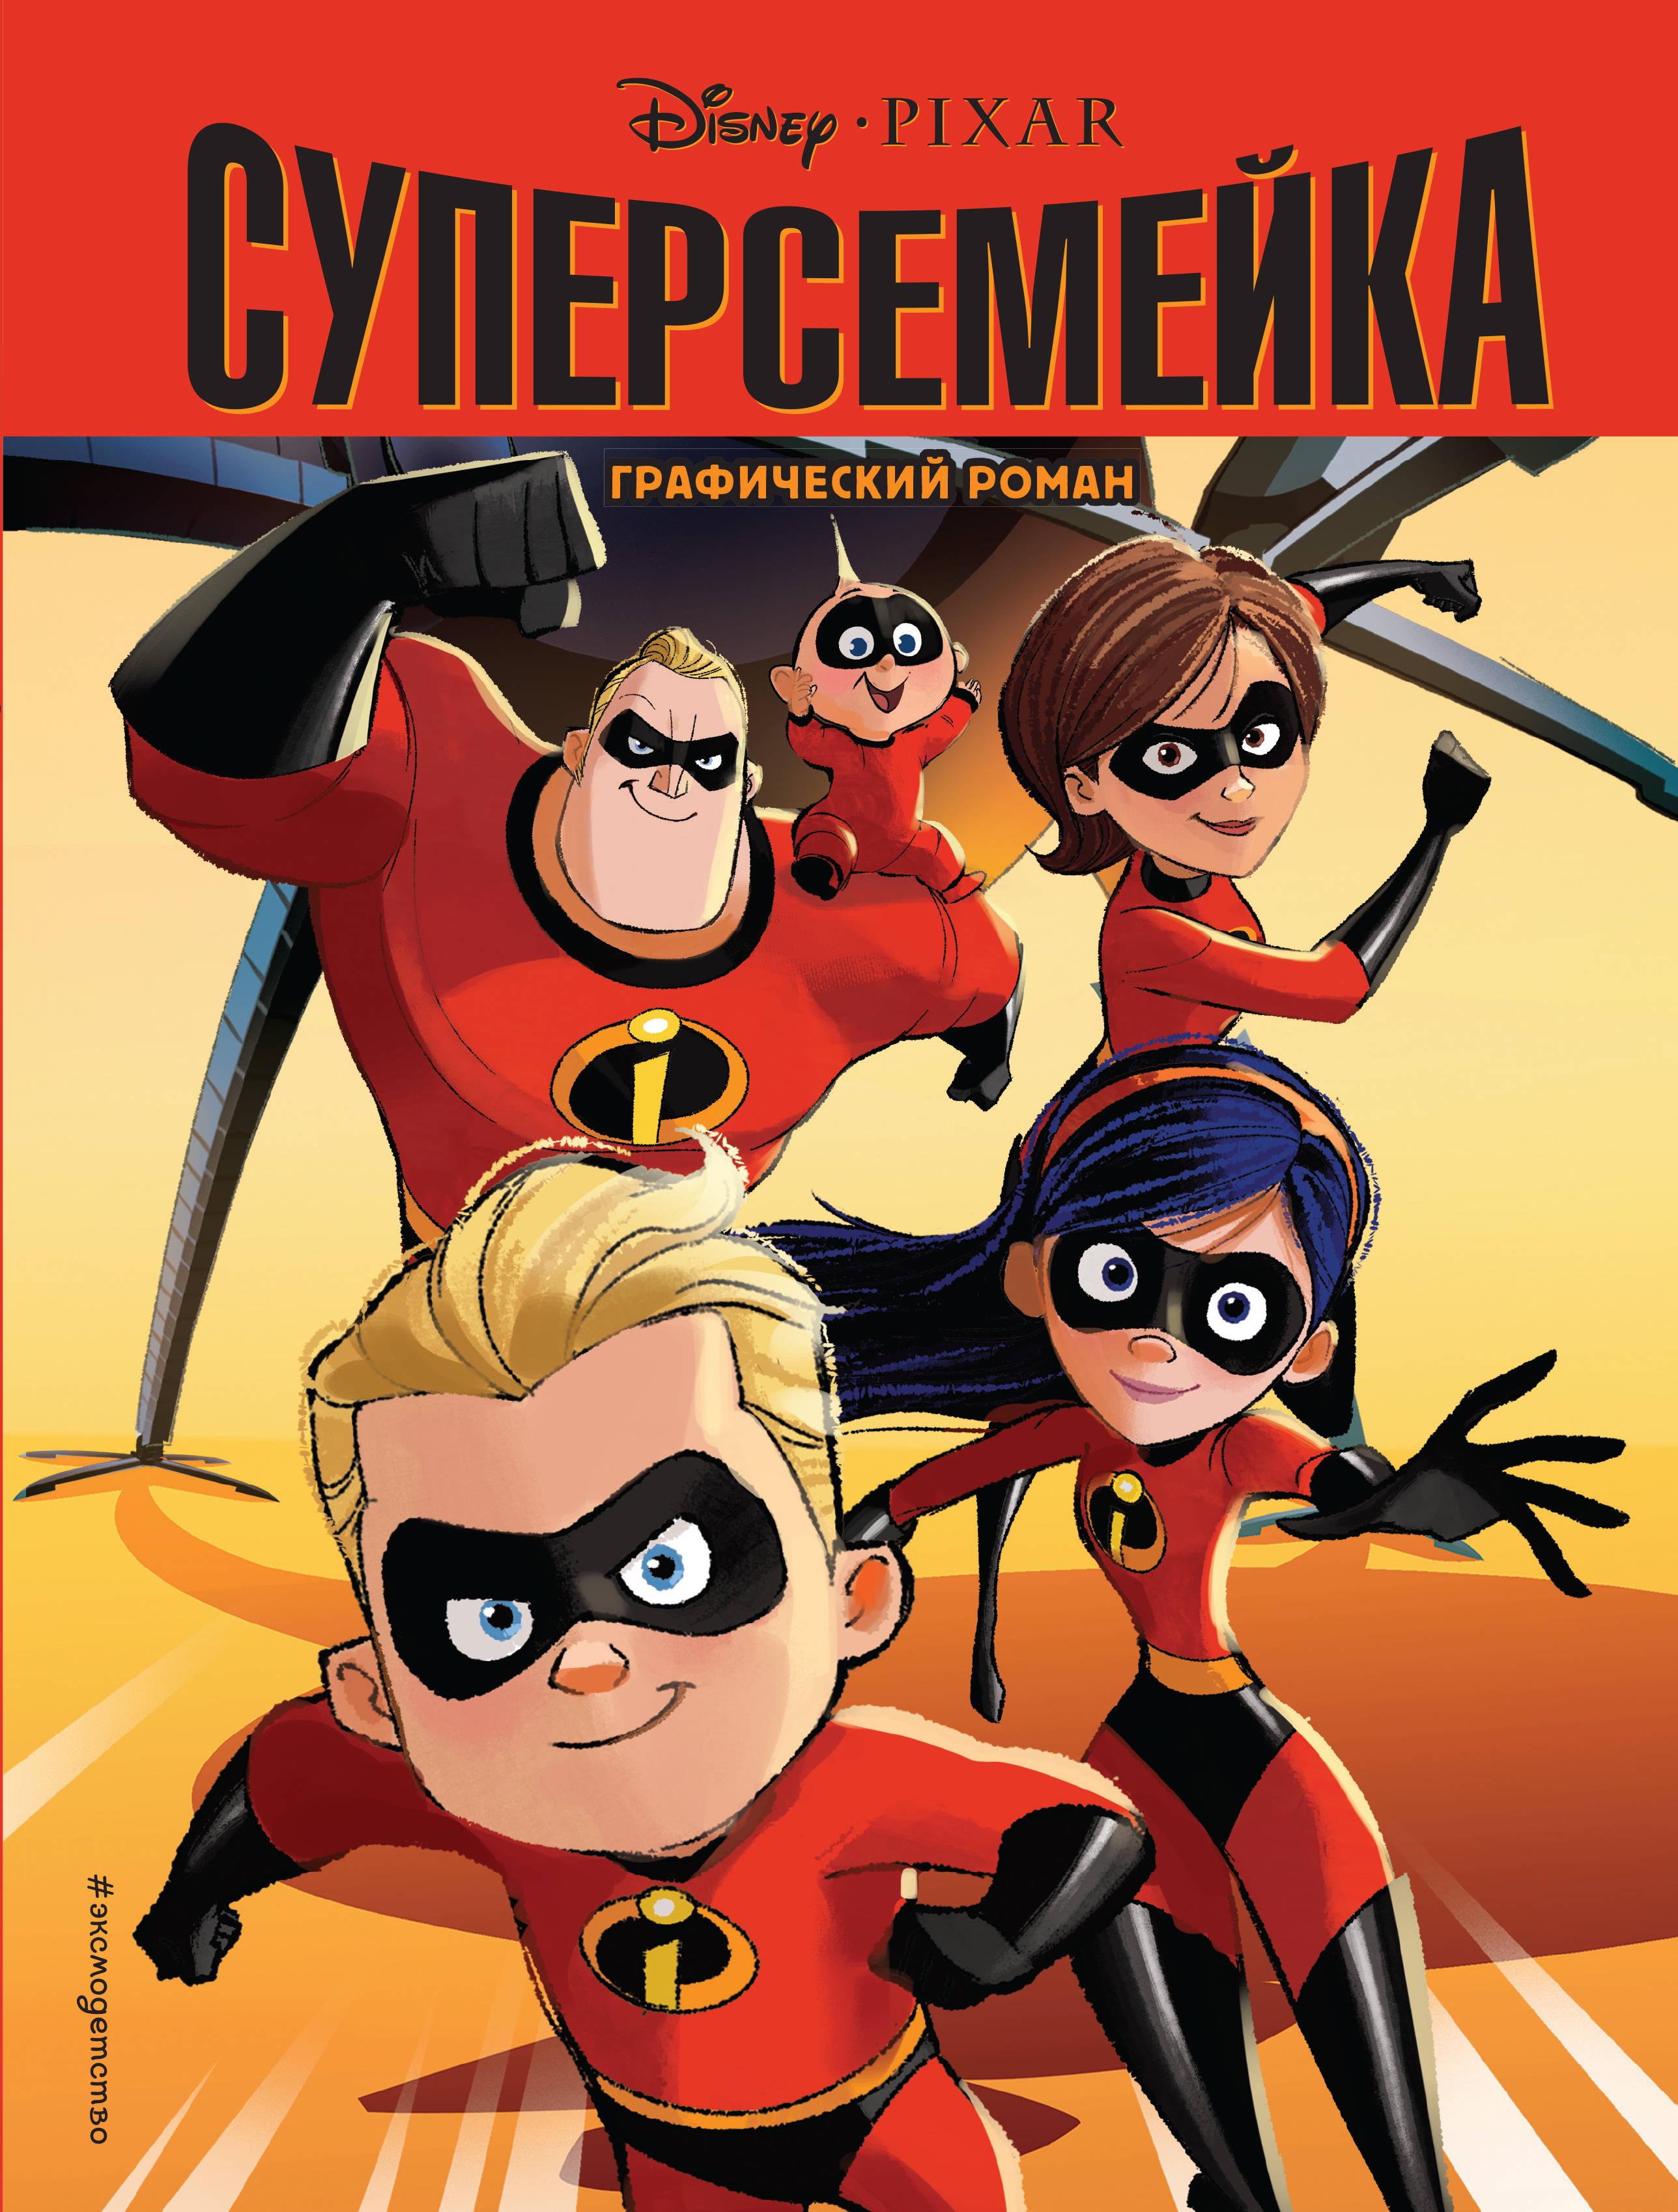 Суперсемейка. Графический роман ISBN: 978-5-04-094601-3